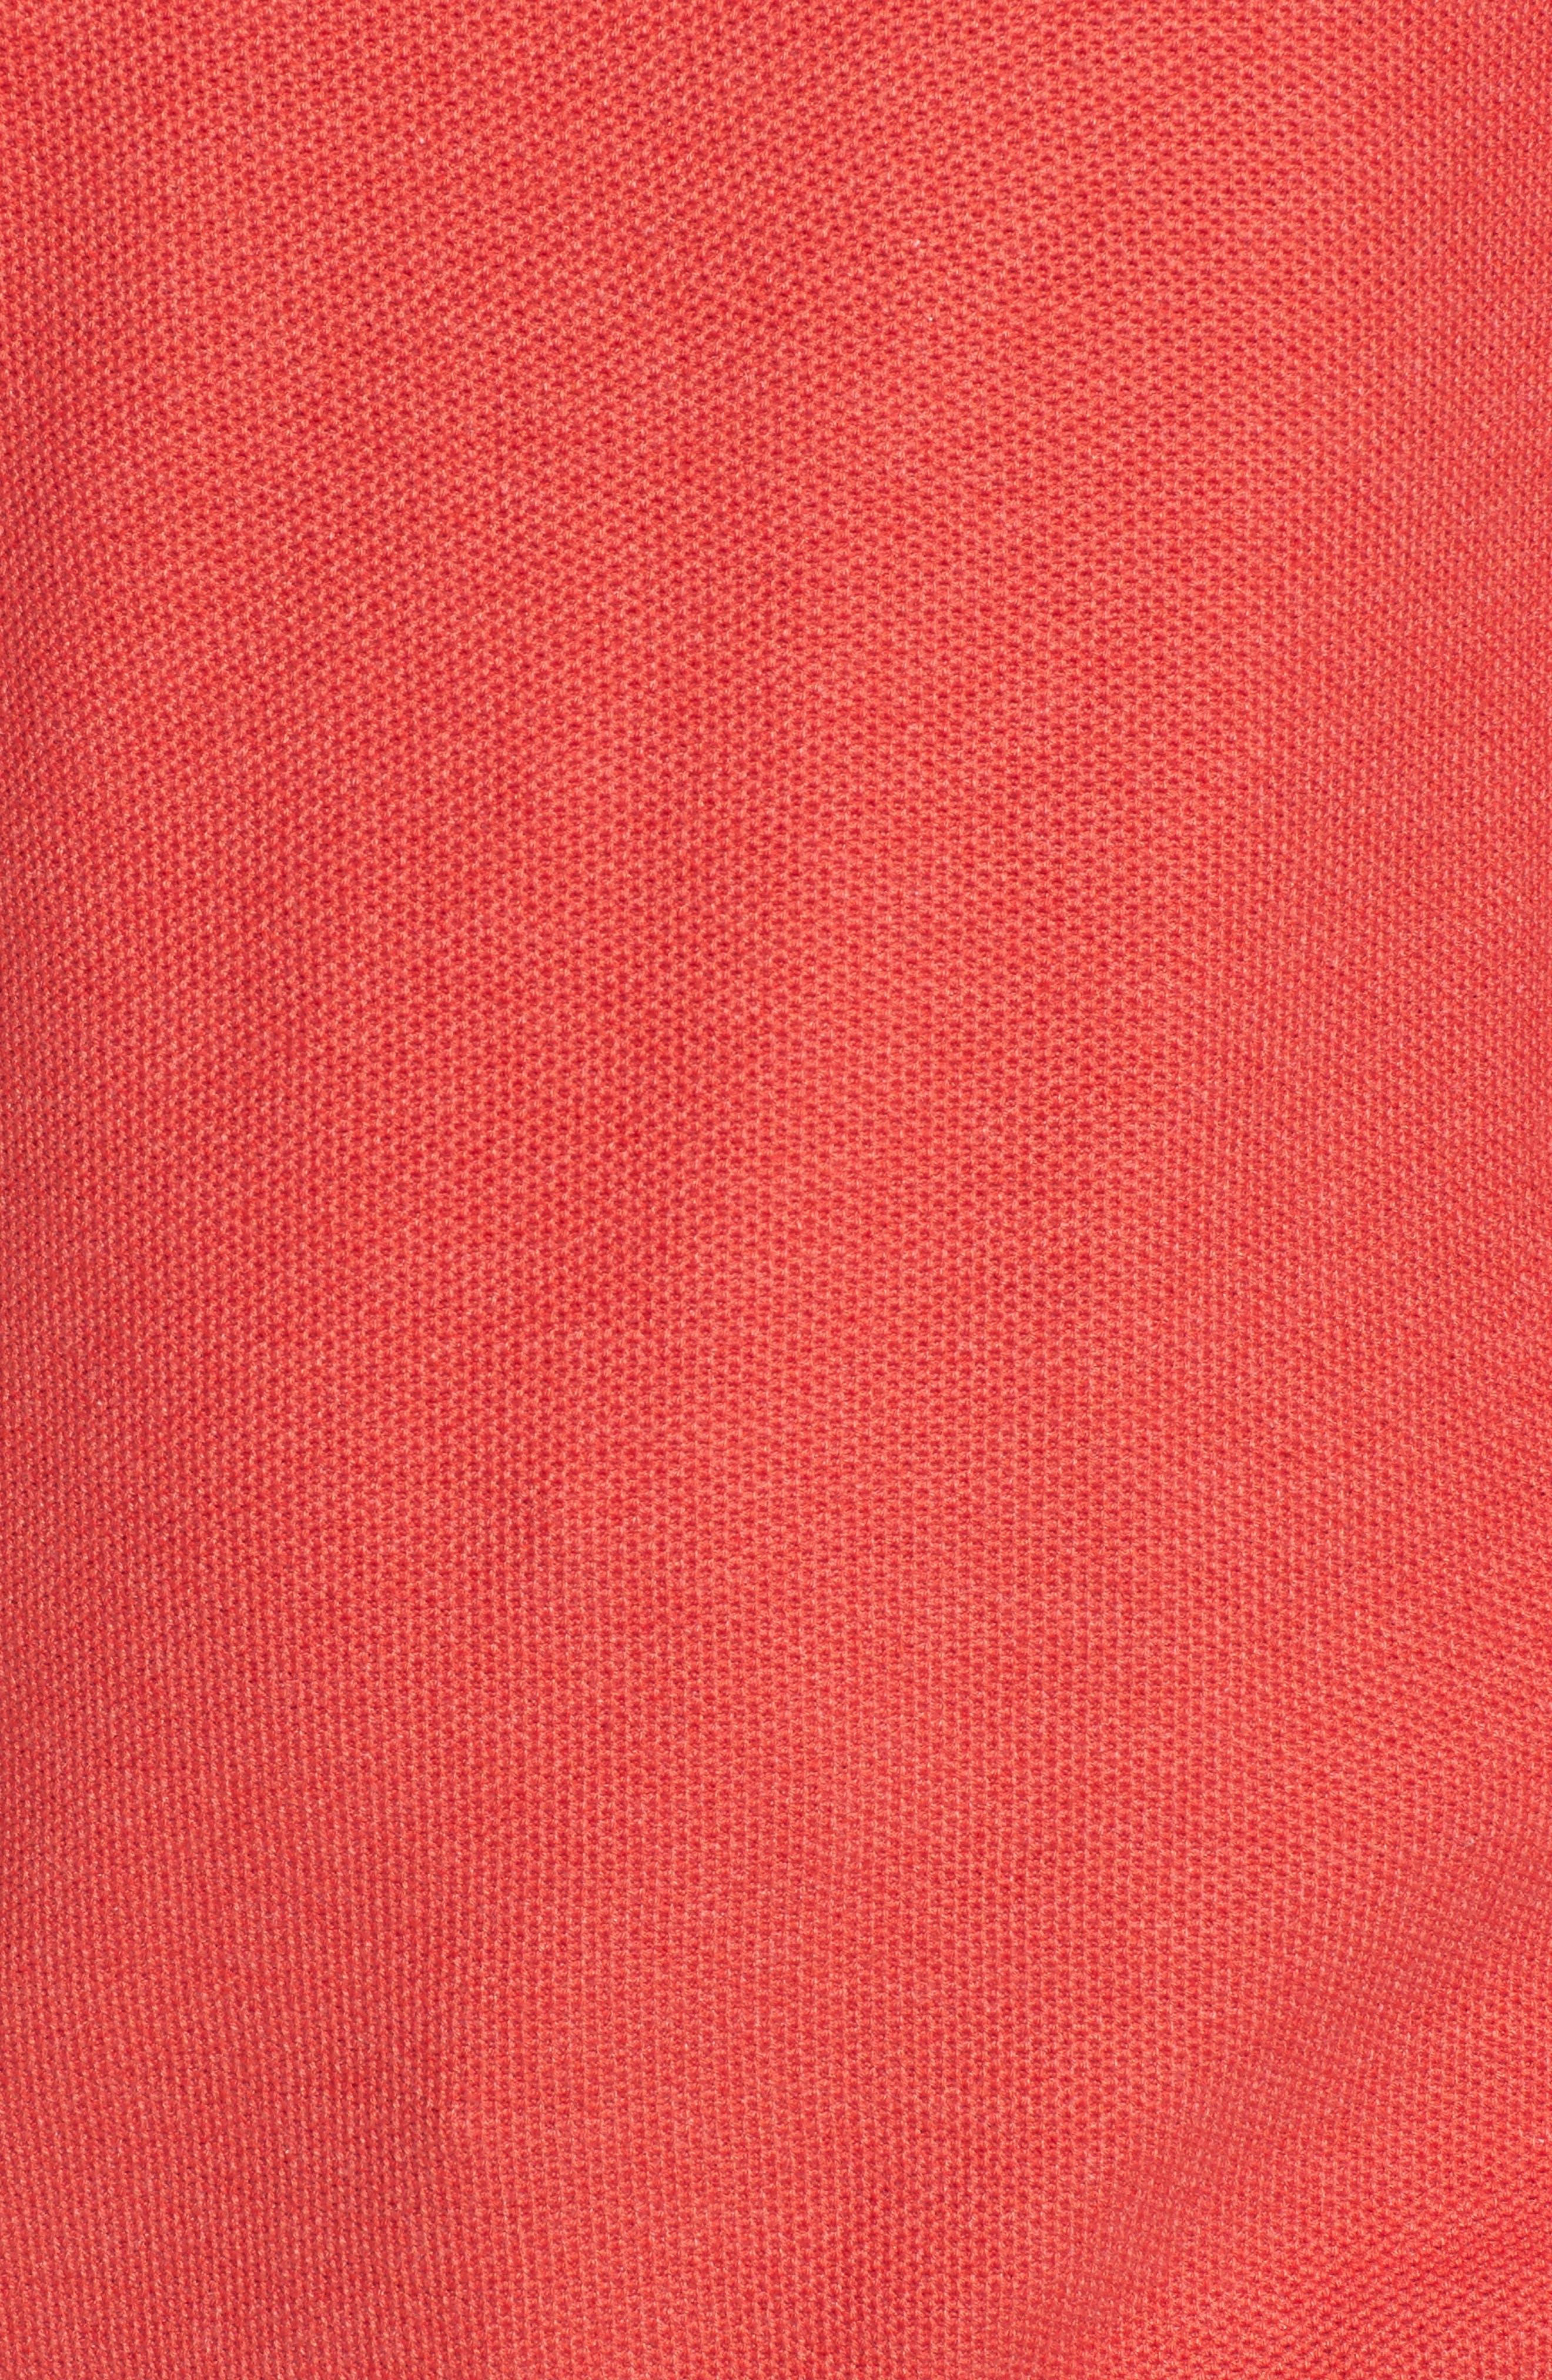 Sorrel Tipped Quarter Zip Sweater,                             Alternate thumbnail 5, color,                             Coral